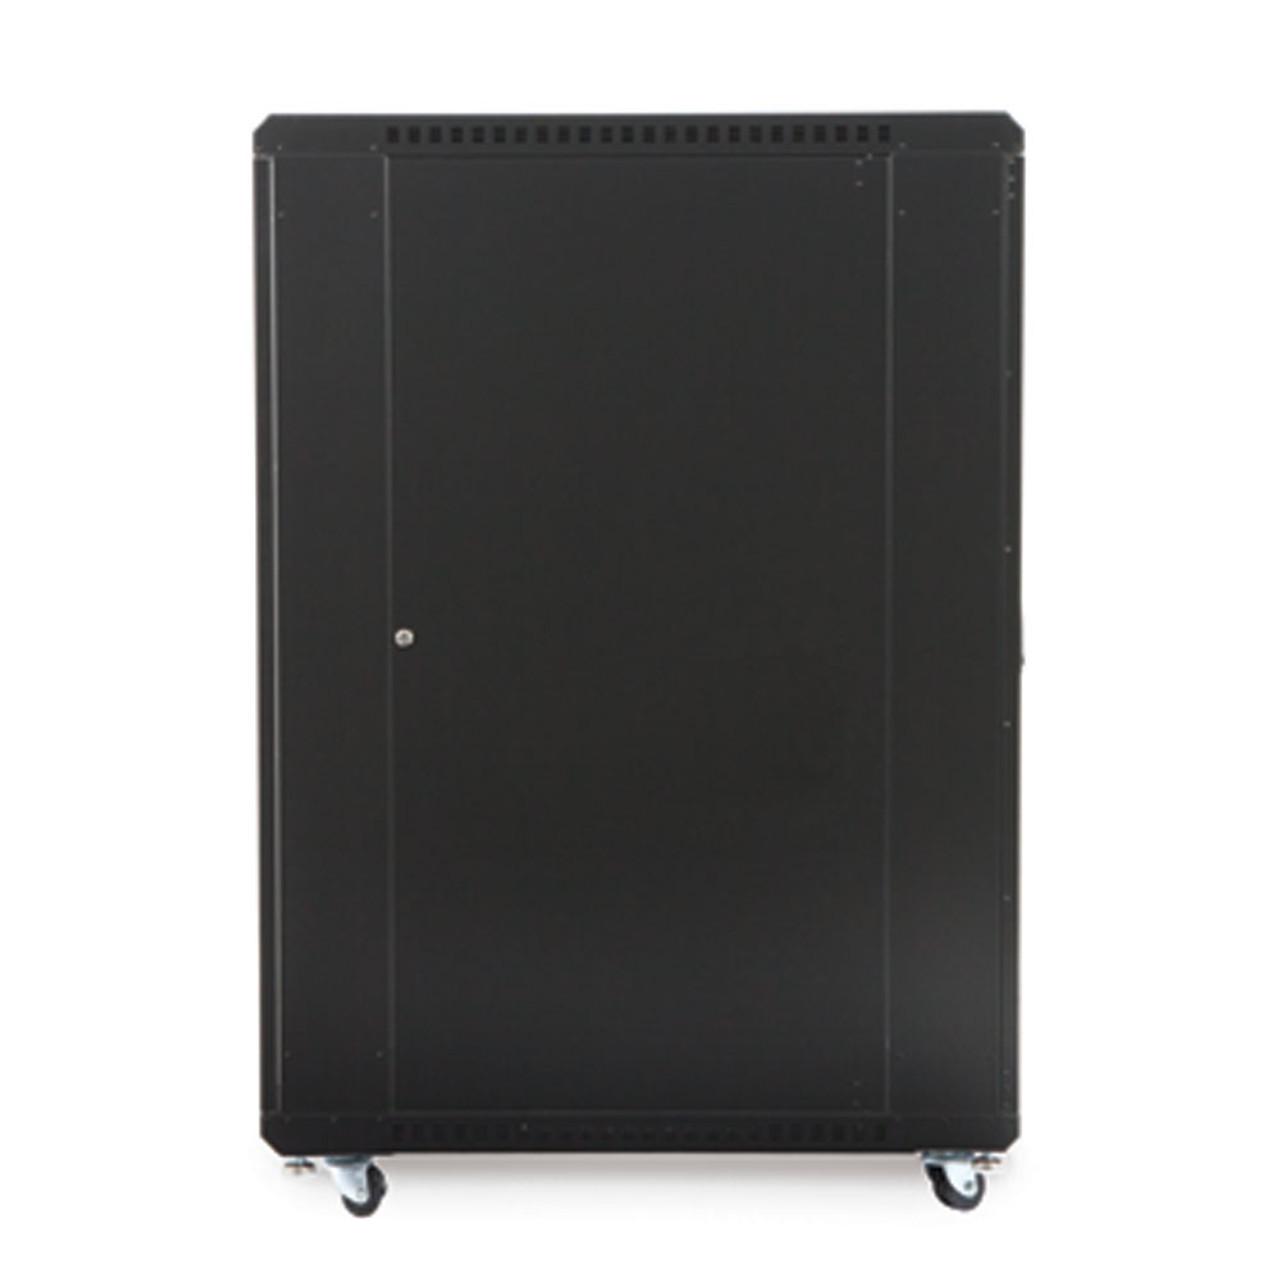 "27U LINIER® Server Cabinet - Vented/Vented Doors - 36"" Depth"